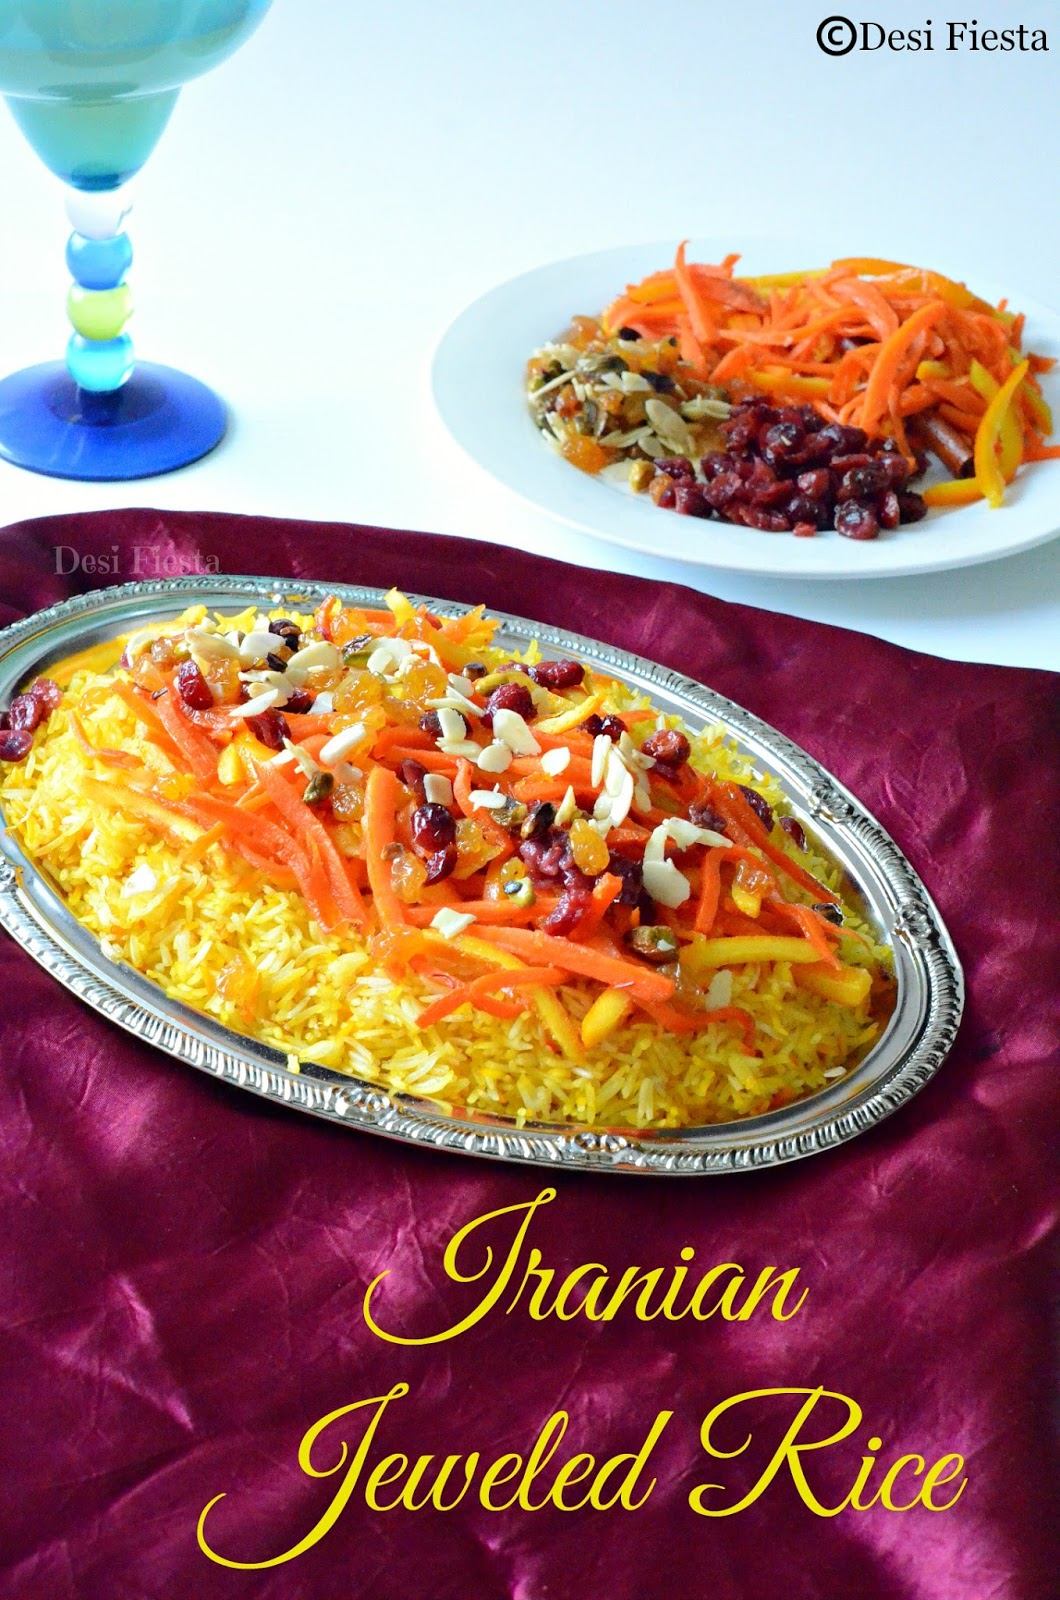 Rice recipes of Iran